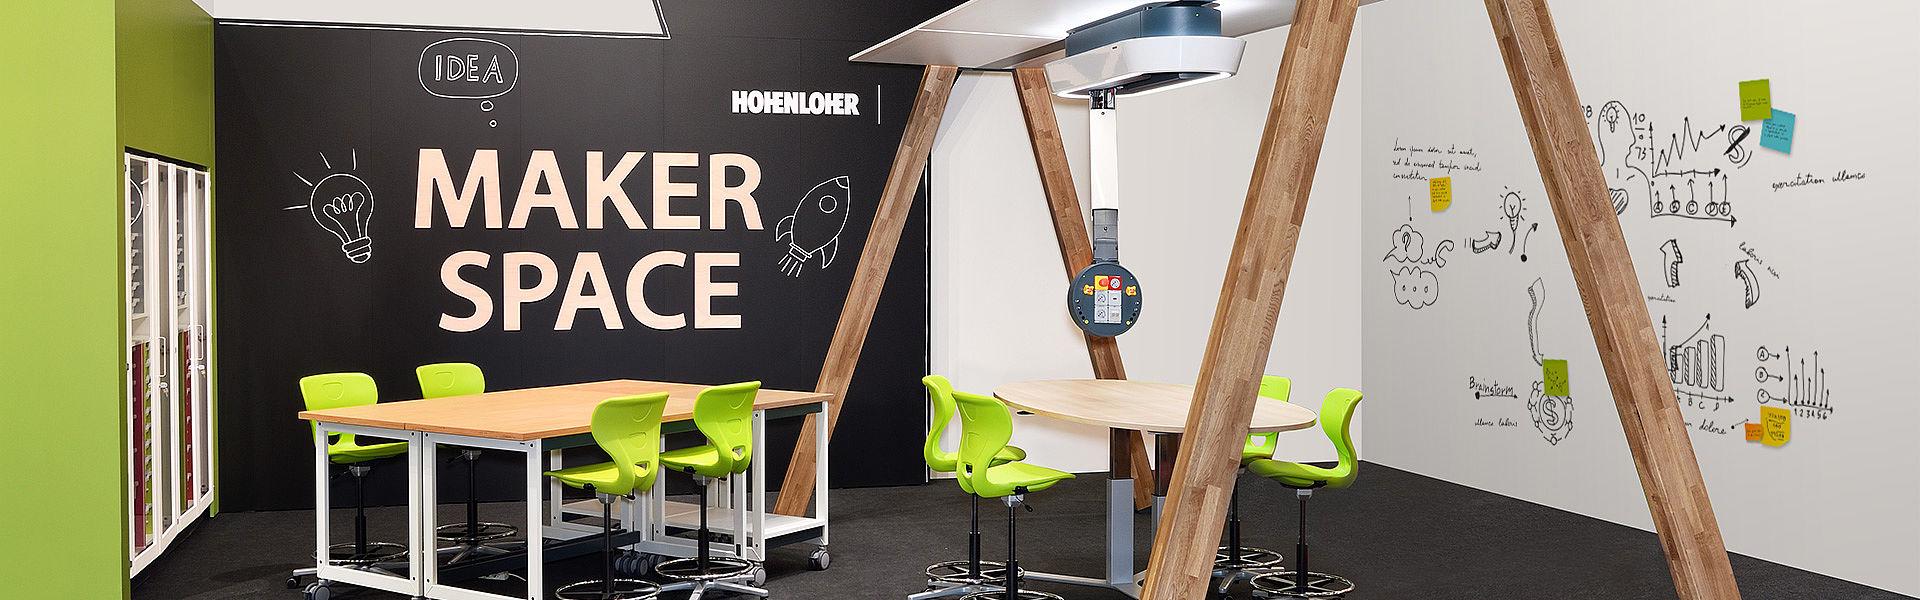 Bild: Corporate Makerspace